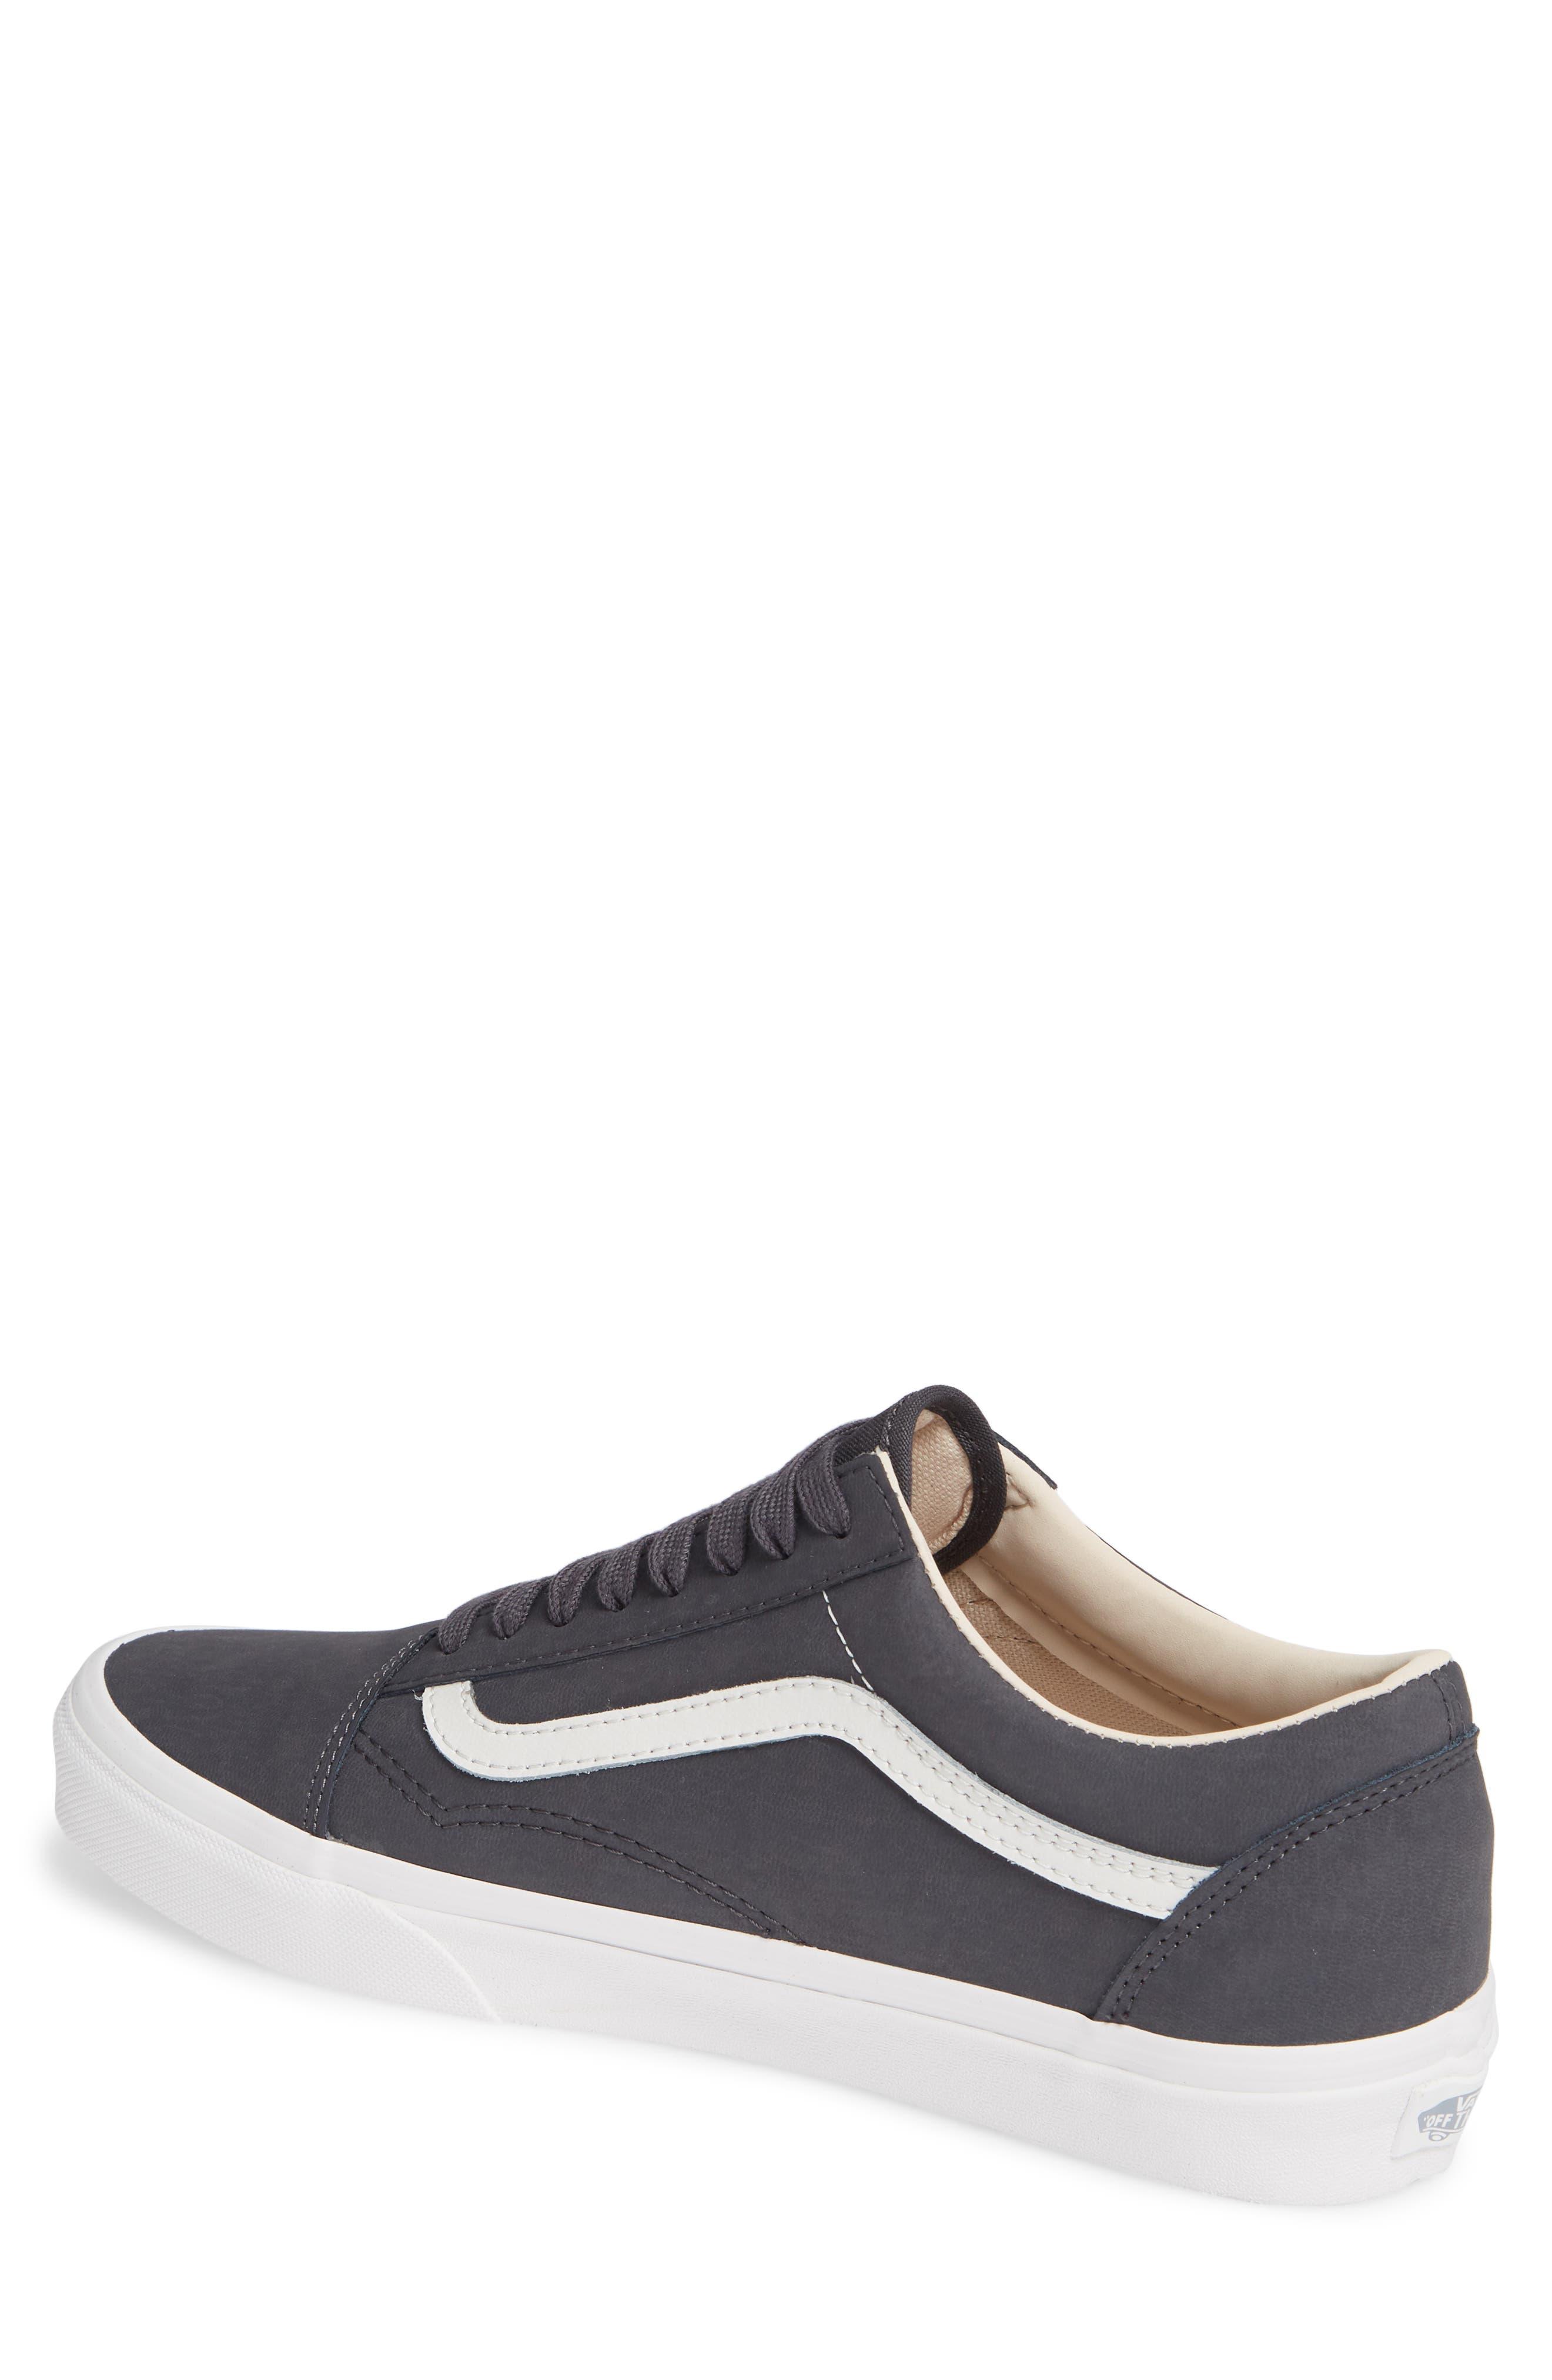 Buck Old Skool Sneaker,                             Alternate thumbnail 2, color,                             021